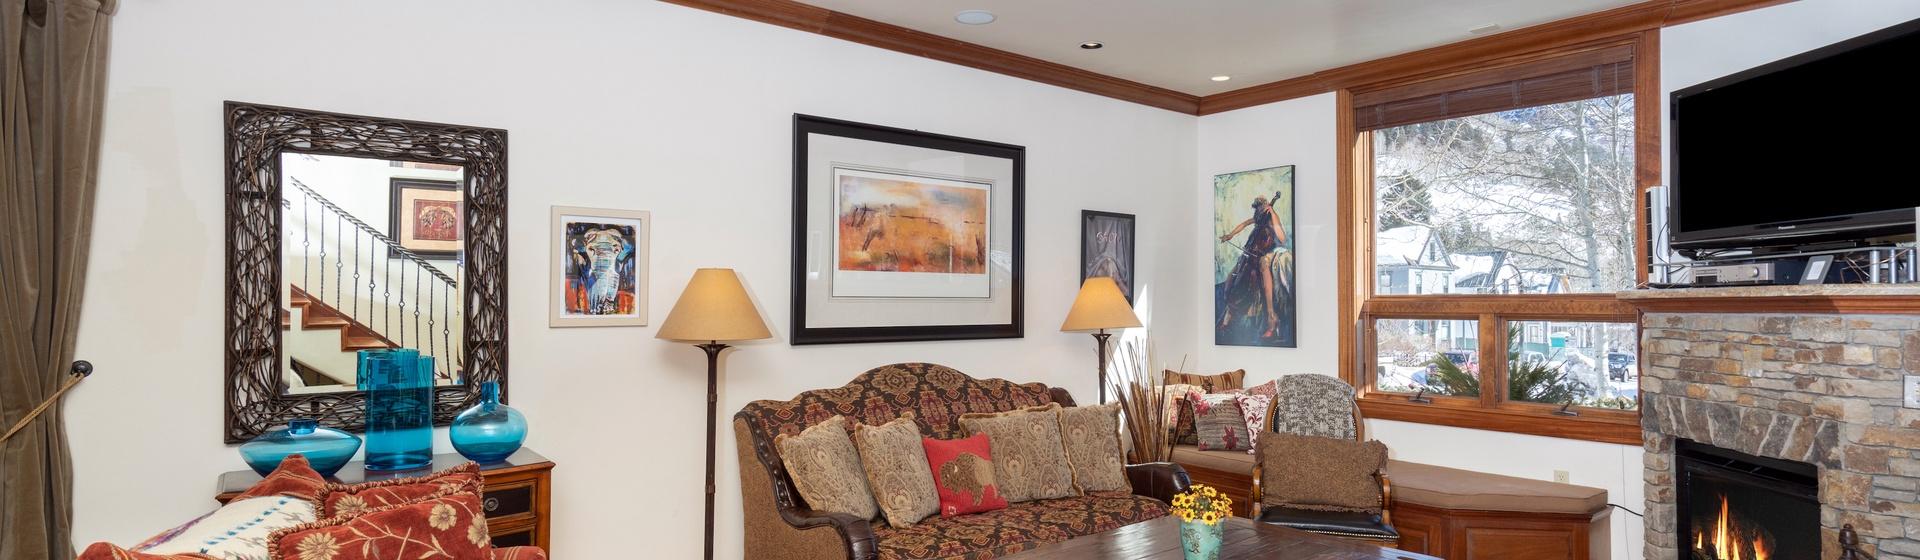 1.02-telluride-tres-casas-B-living-room-web.jpg